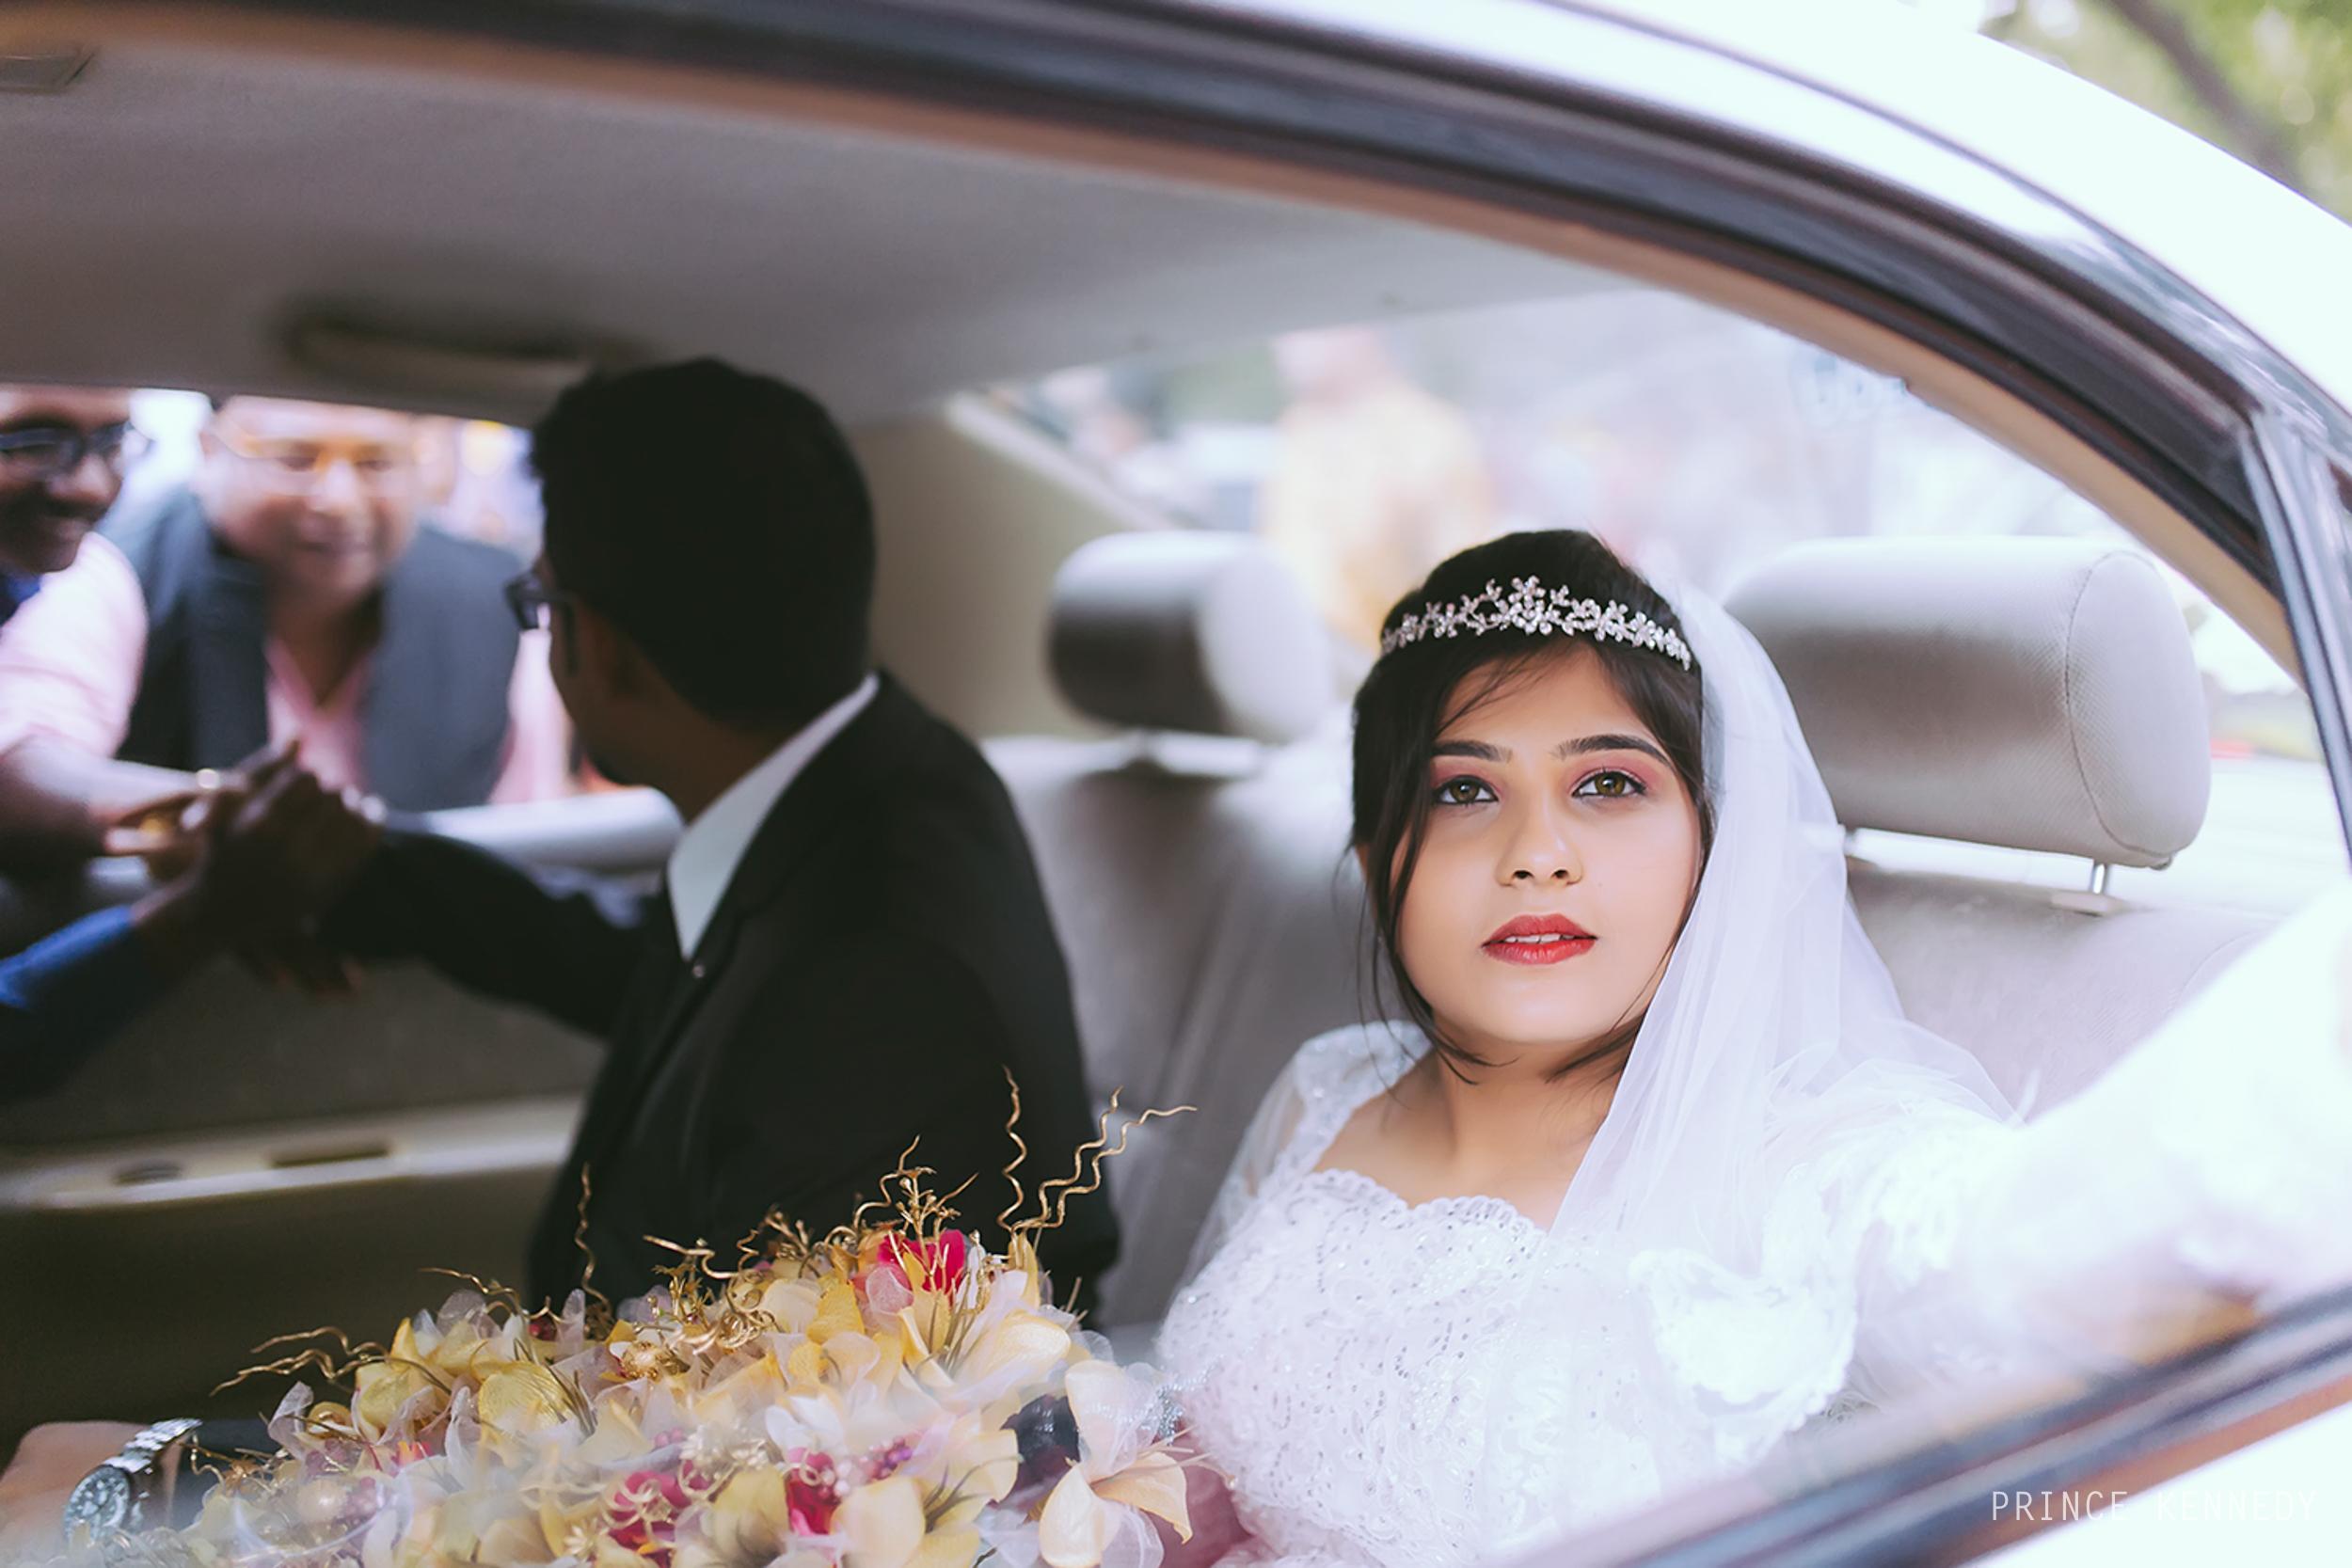 Wedding-weddings-candid-photography-chennai-photographer-best-photography14.jpg